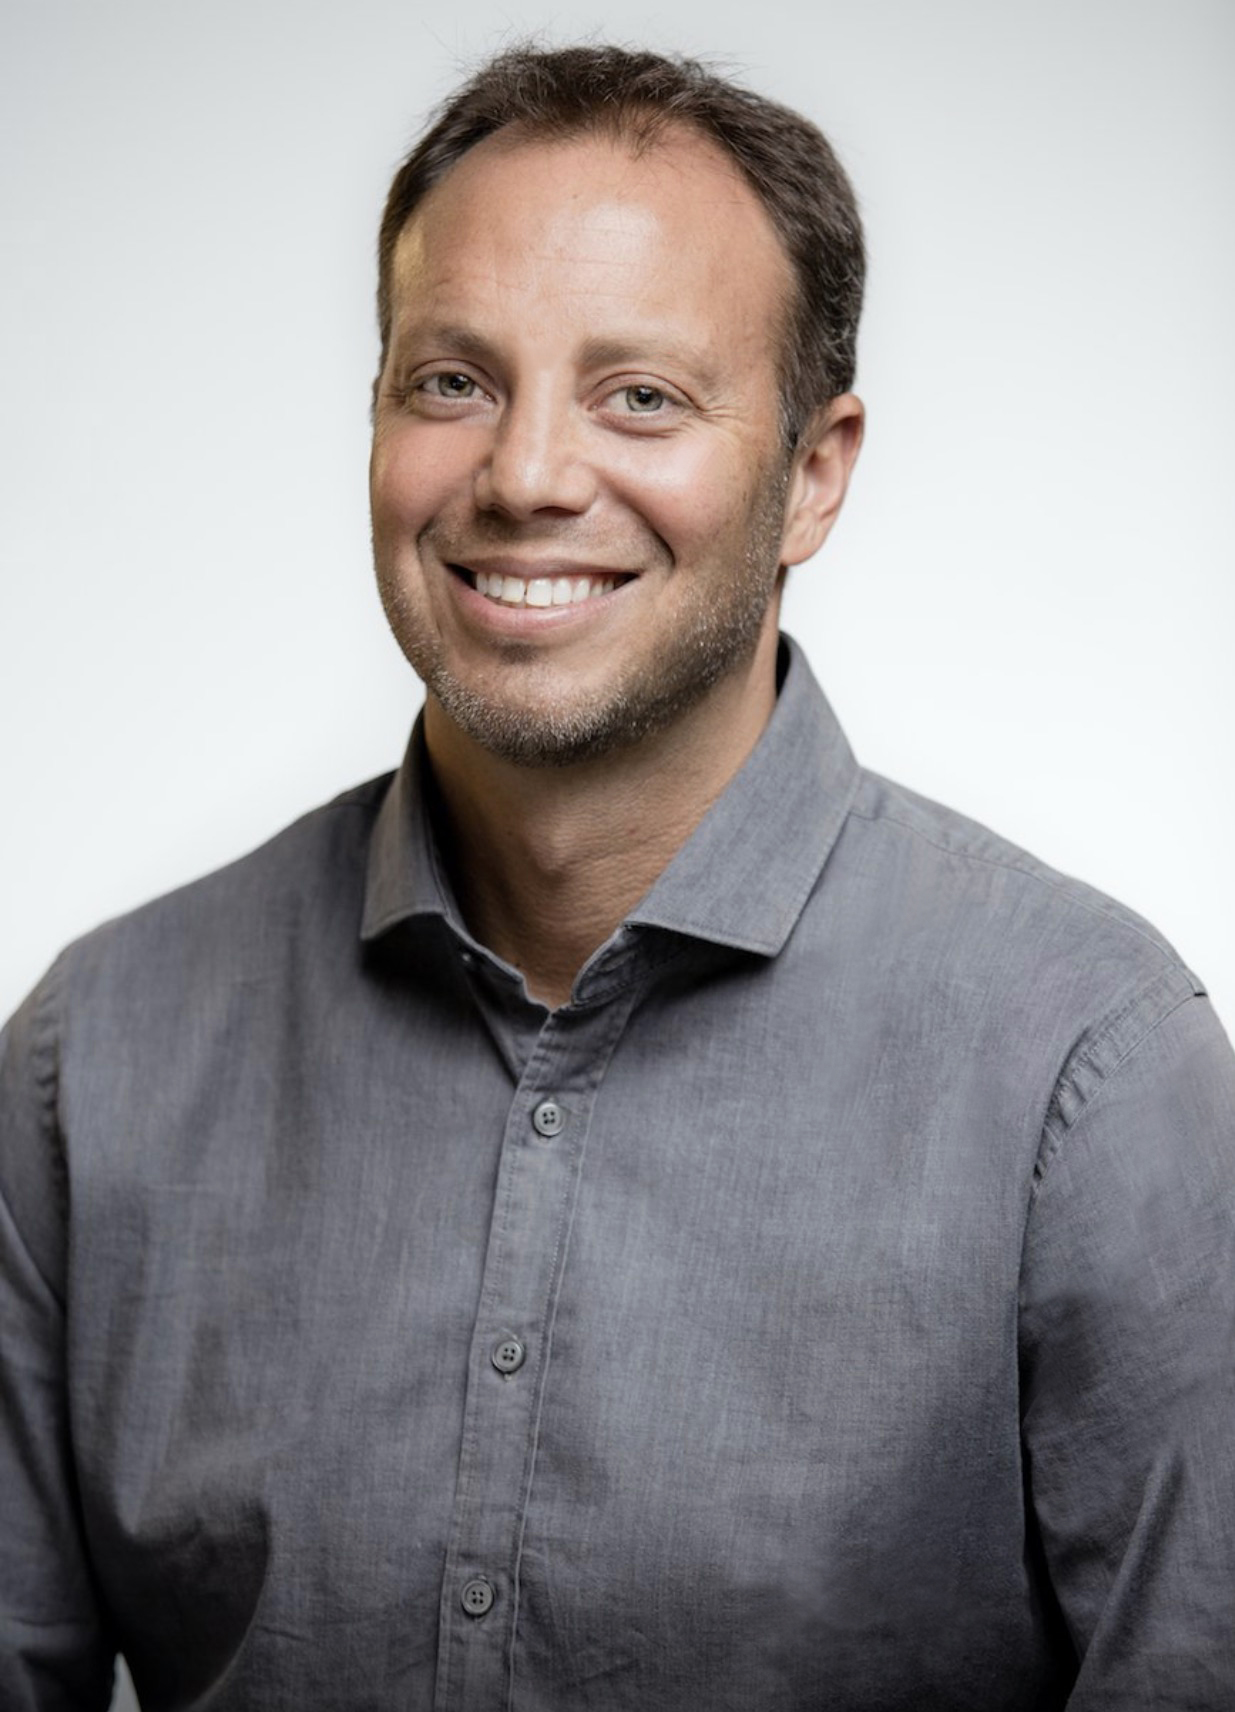 CEO Jeff Mosier Headshot image